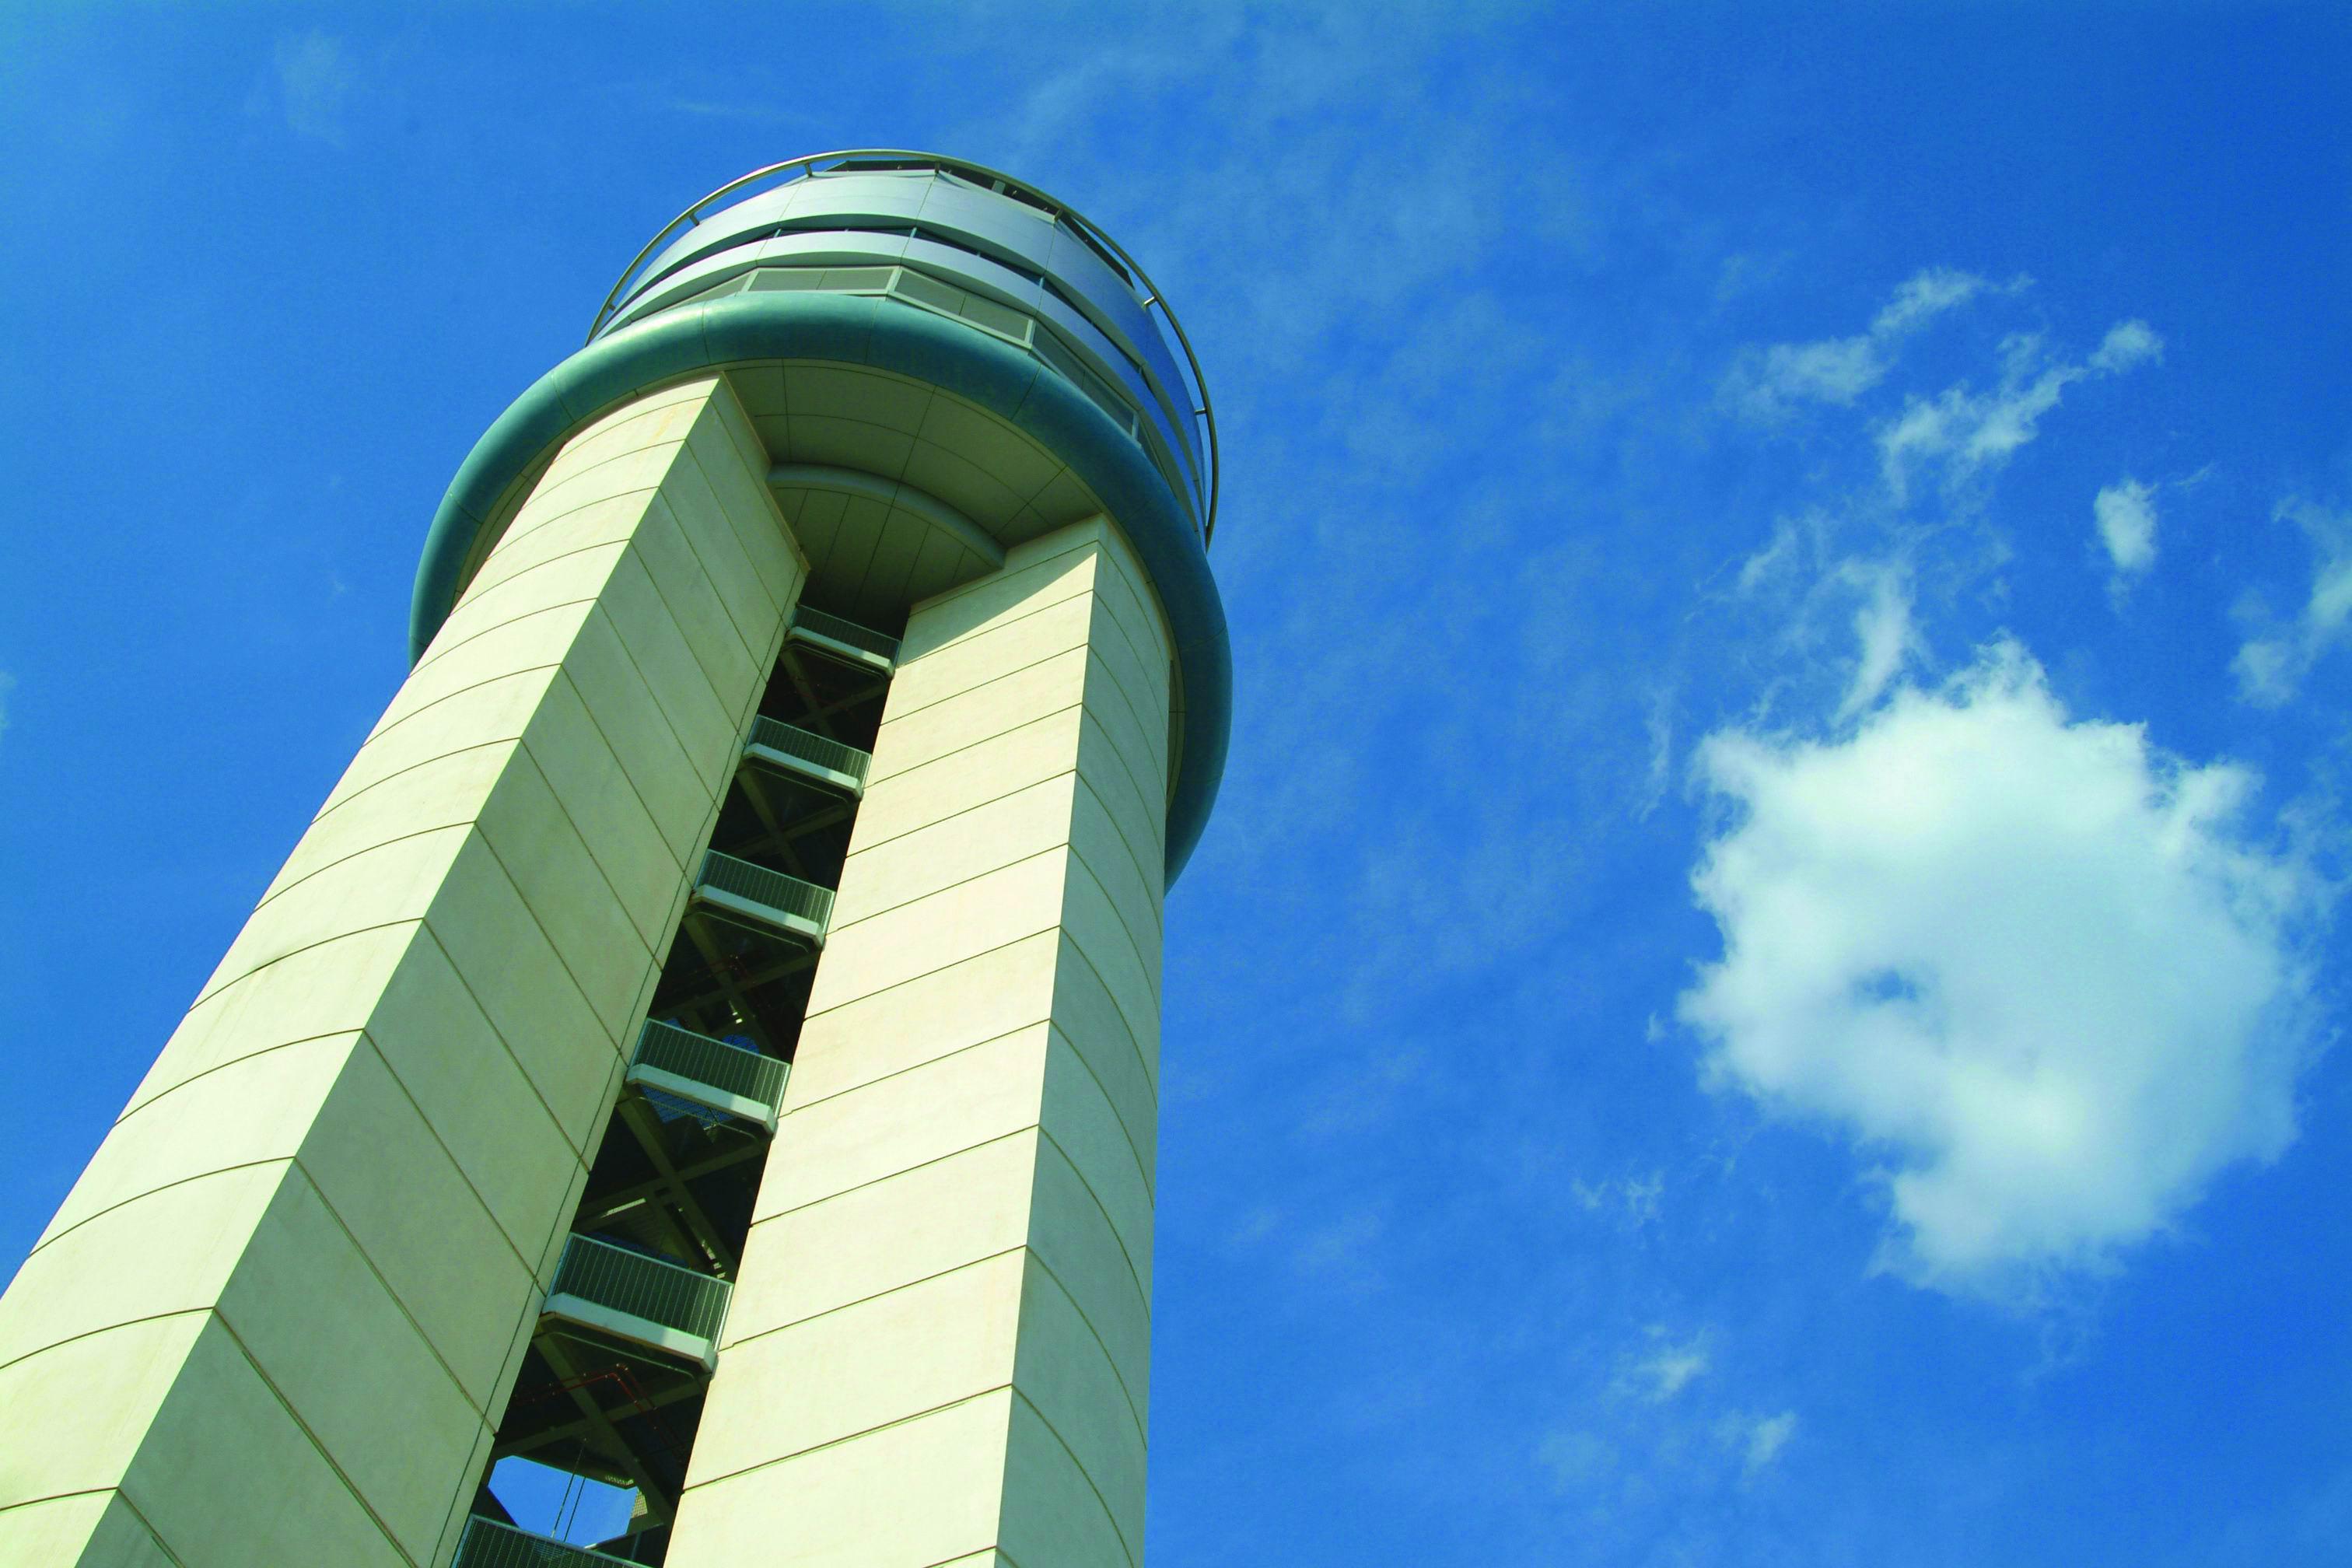 Control tower at Port Columbus International Airport